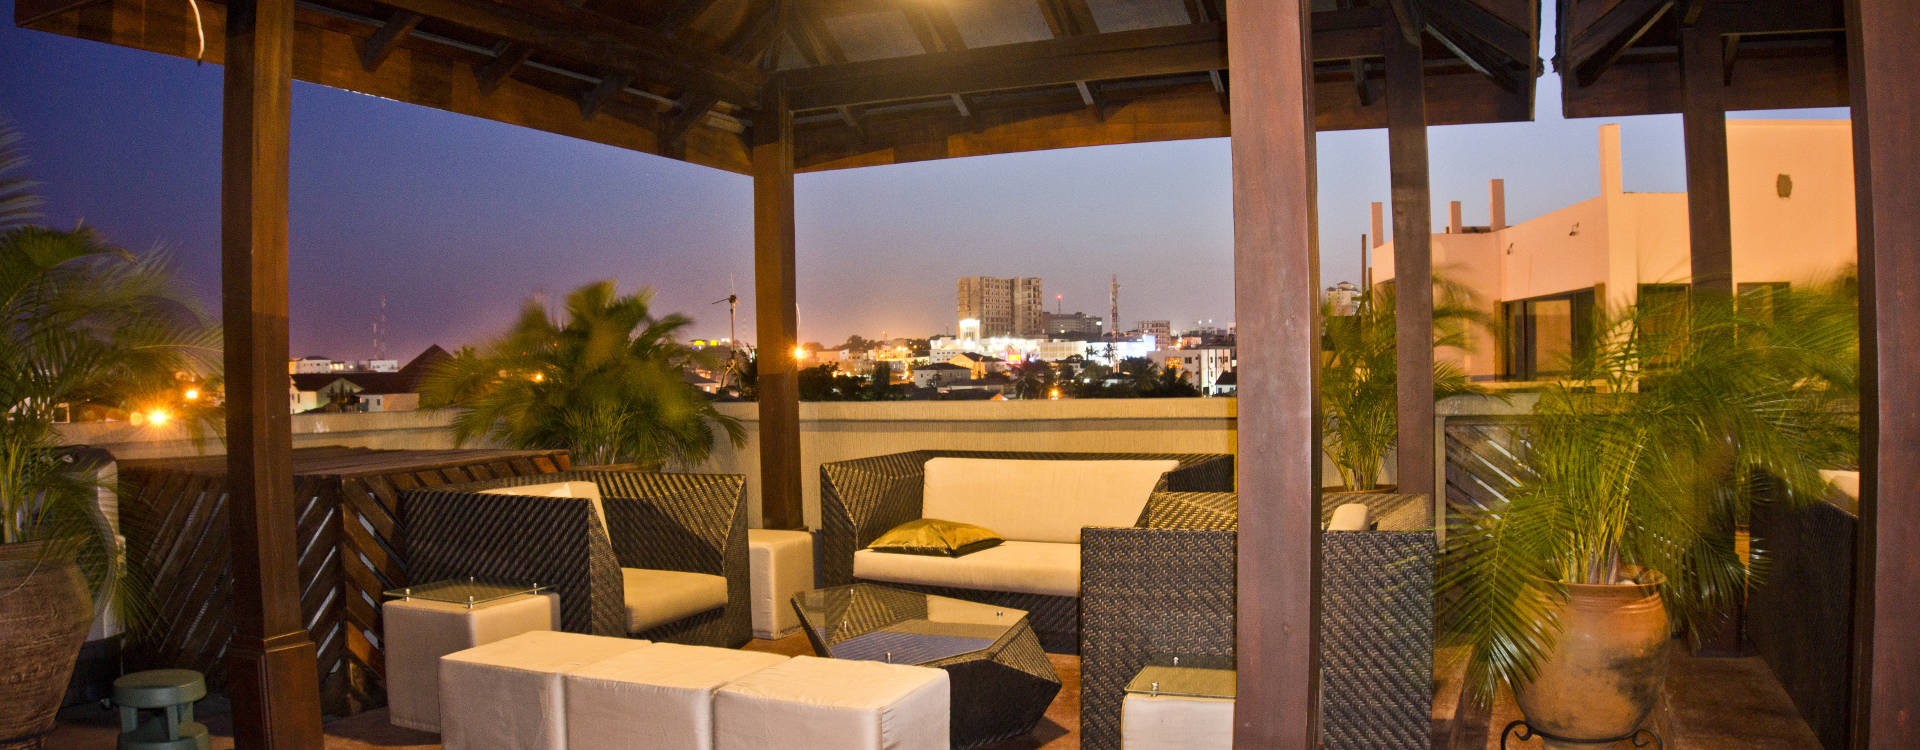 how to get to tropical enclave hotel accra rh tropicalenclavehotel com